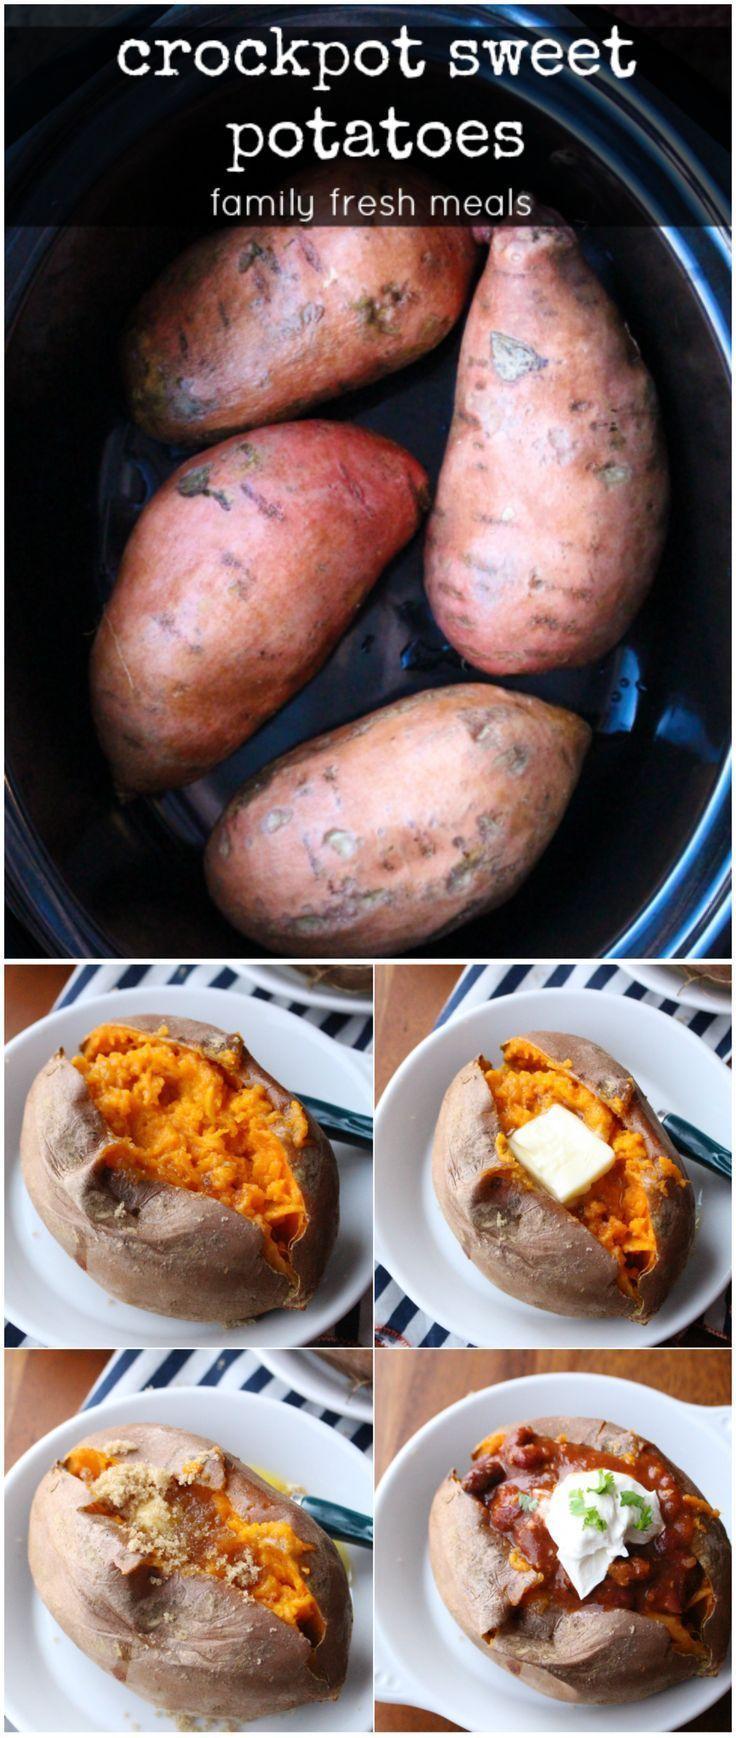 How to make Crockpot Sweet Potatoes - Lots of topping ideas! FamilyFreshMeals.com